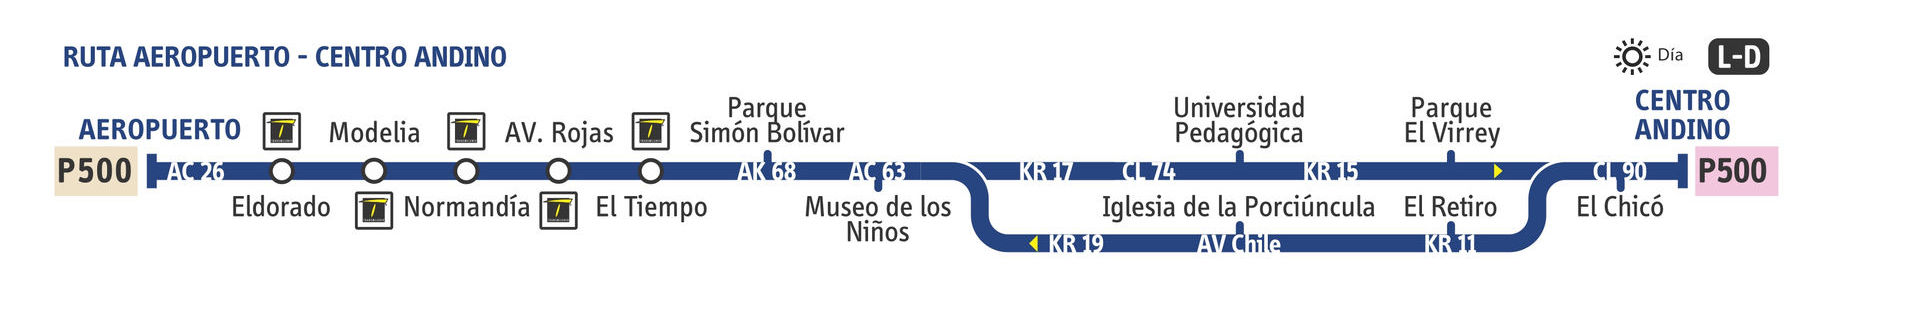 Ruta SITP: P500 Aeropuerto ↔ Centro Andino [Urbana] 2